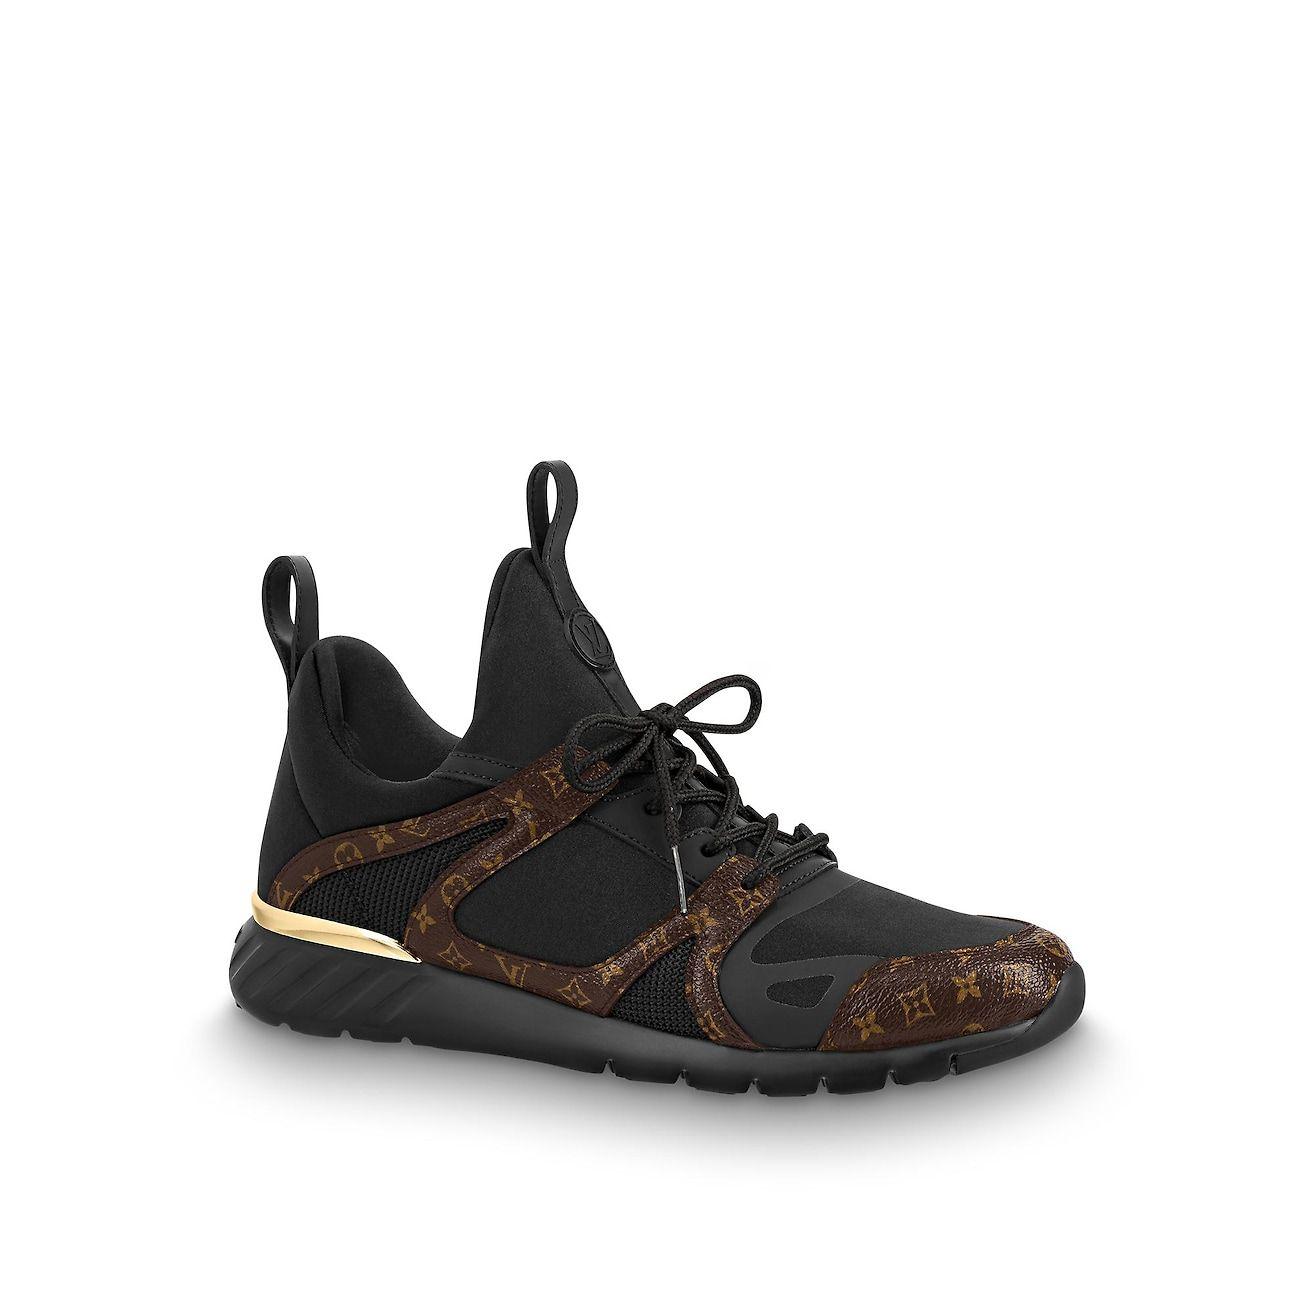 446ba32536a Aftergame Sneaker | Kicks | Sneakers, Louis vuitton, Louis vuitton trunk